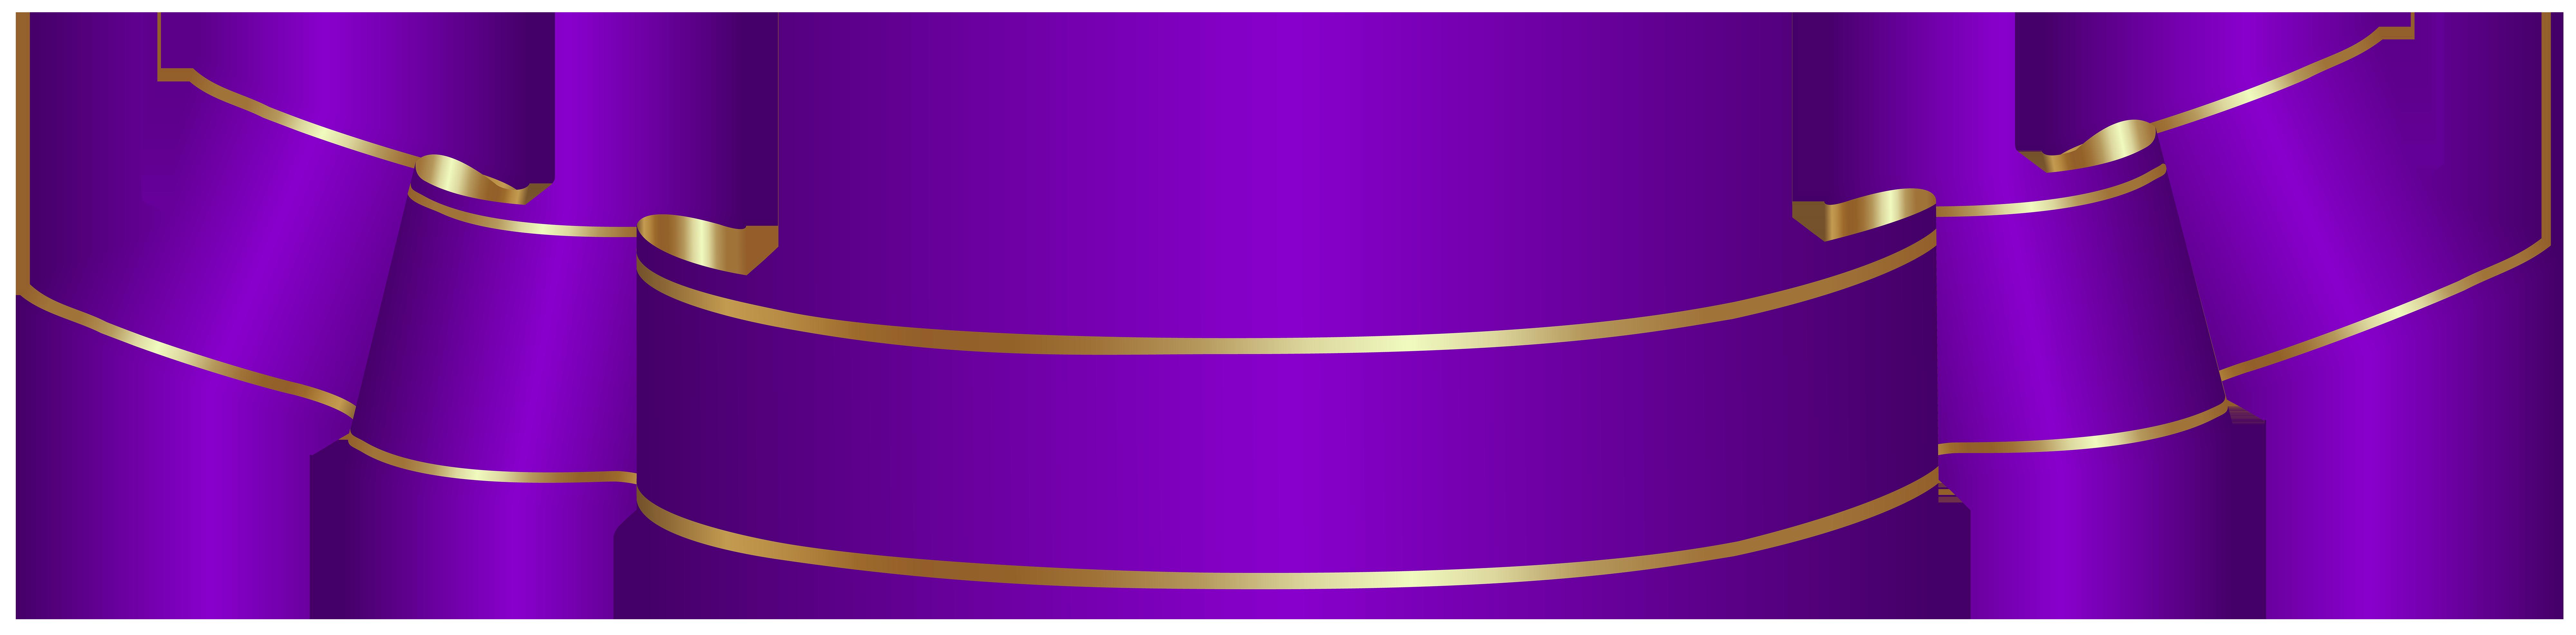 Purple clipart banner. Ribbon clip art pink